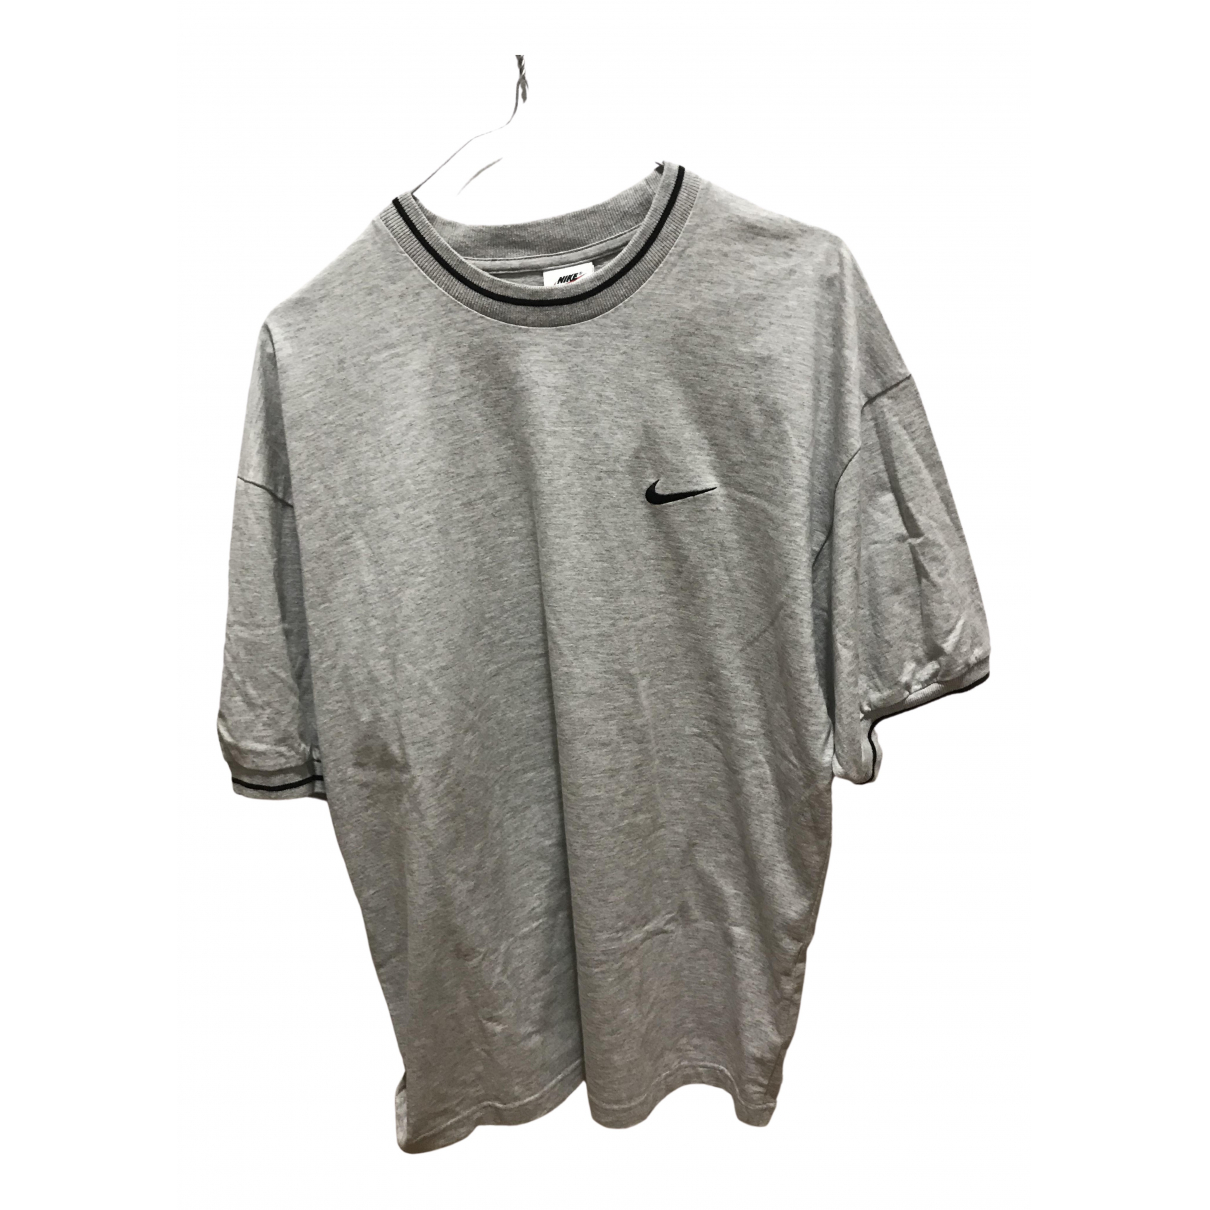 Nike \N T-Shirts in  Grau Baumwolle